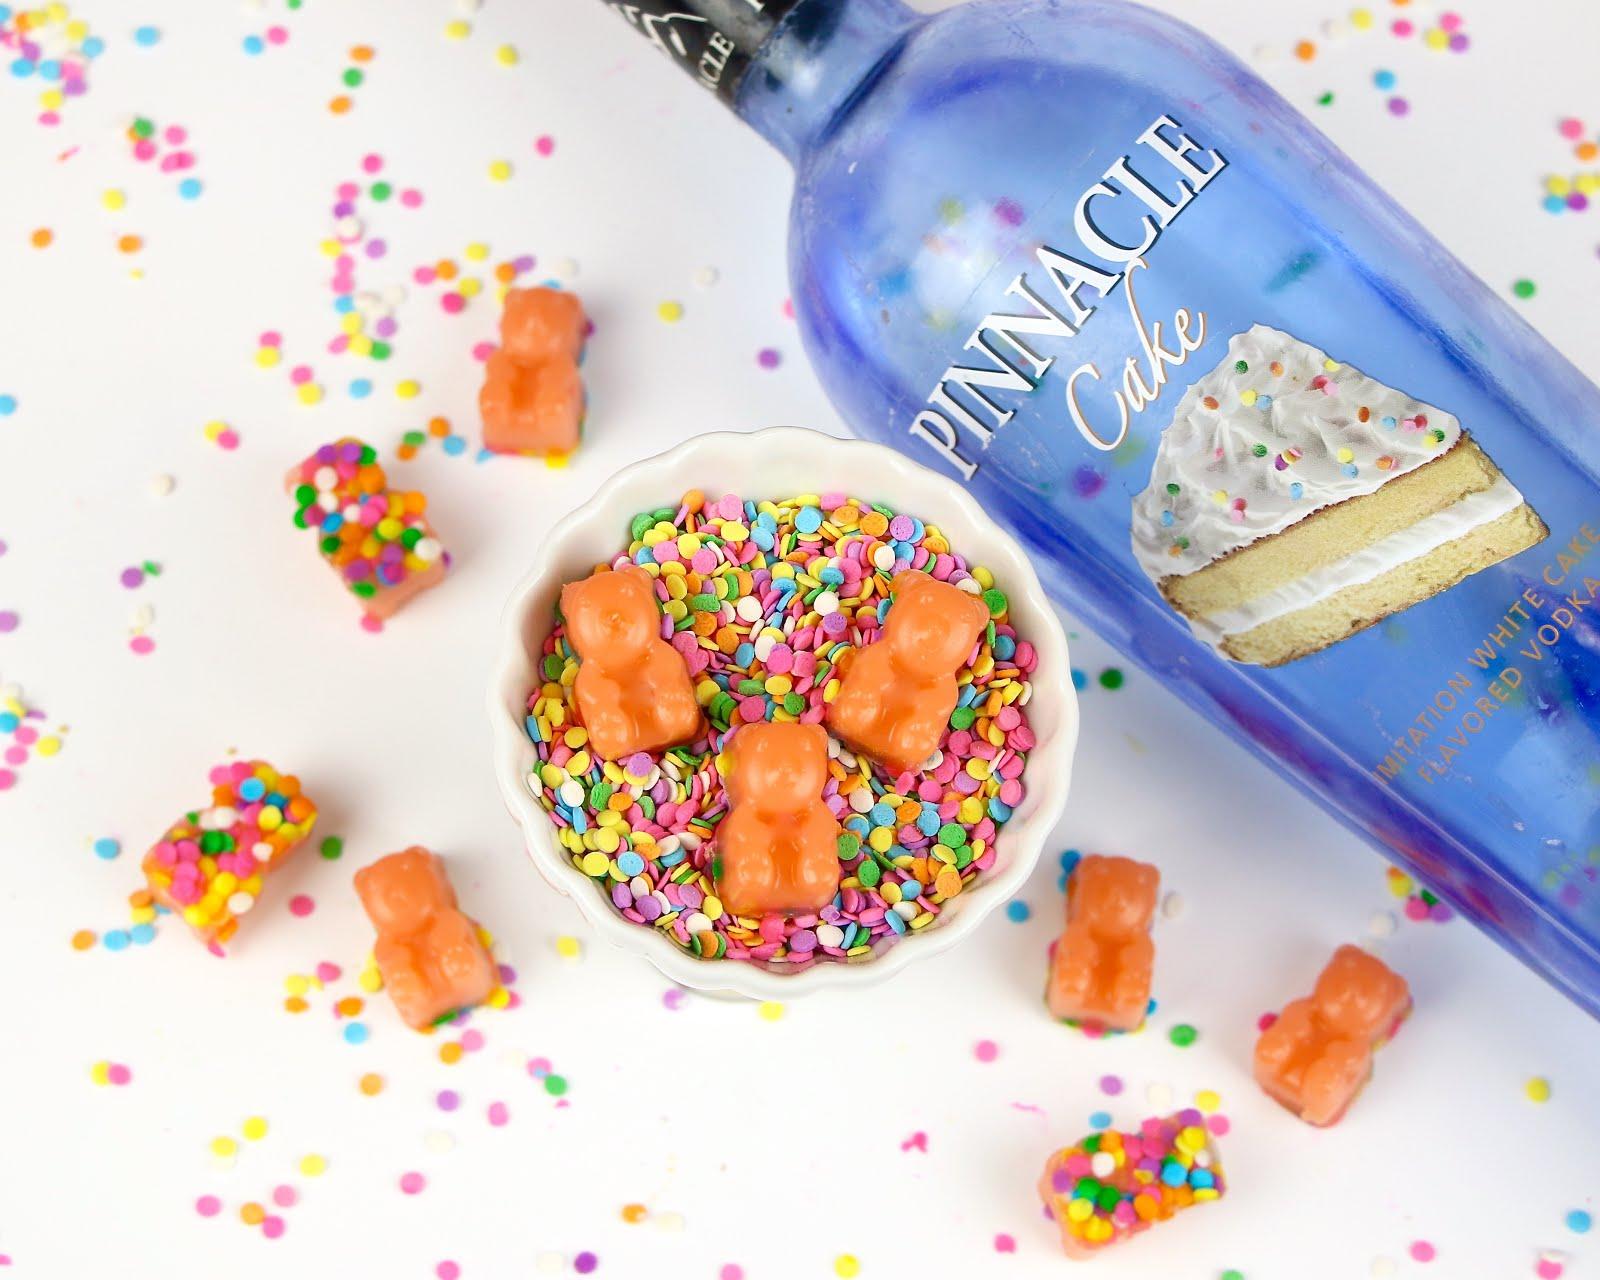 Video Funfetti Cake Vodka Gummy Bears The Lindsay Ann